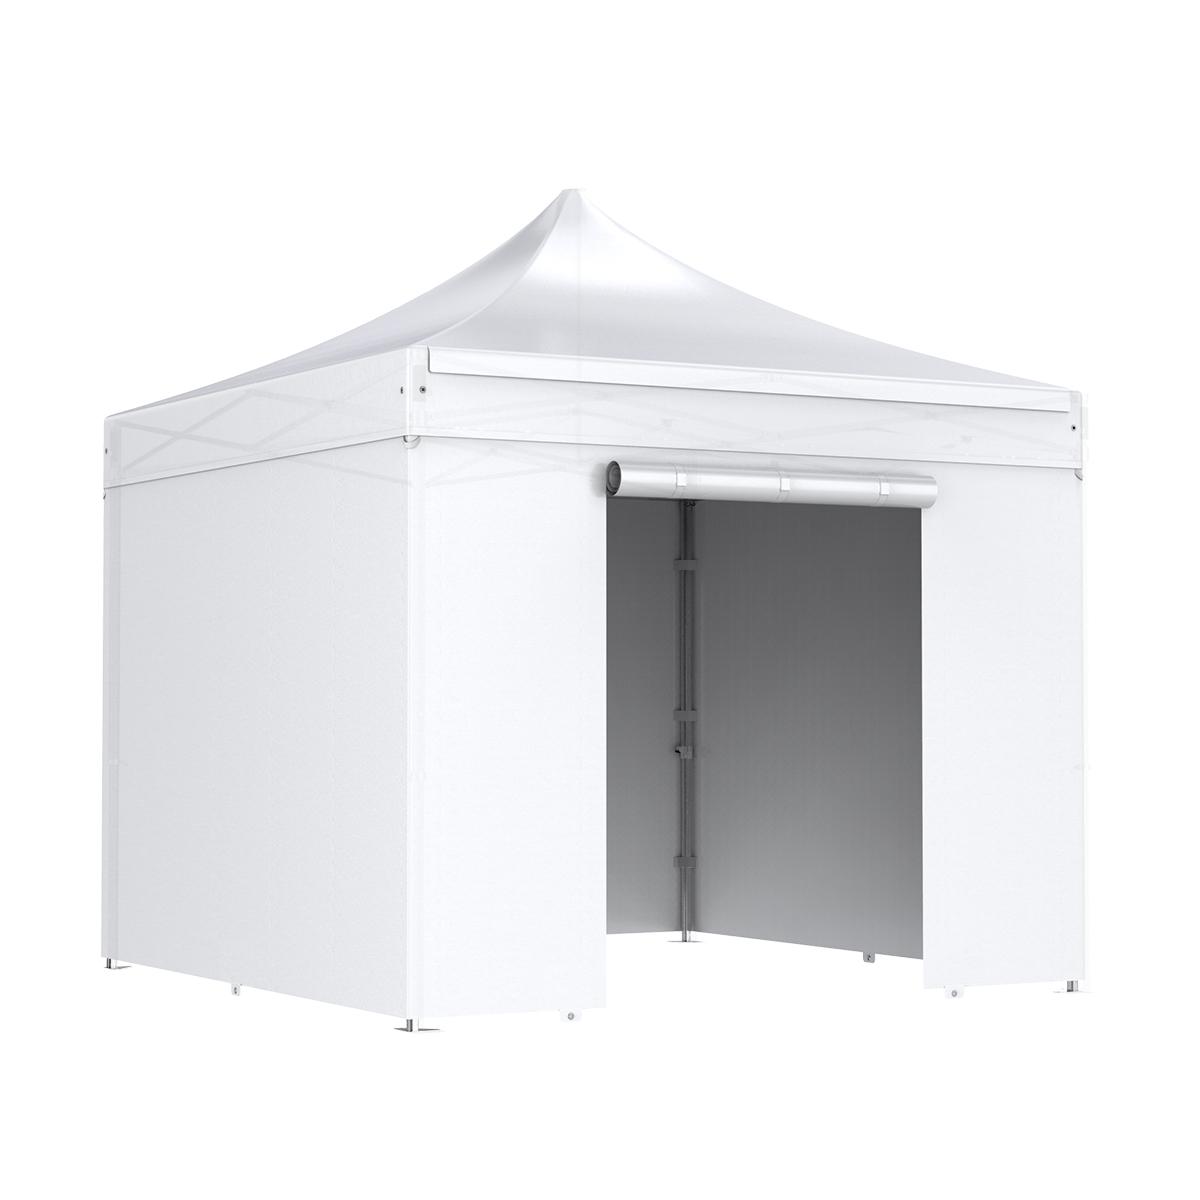 nur wei komplettset premium faltpavillon 3x3m alu 50 pvc520g m feuerfest und. Black Bedroom Furniture Sets. Home Design Ideas